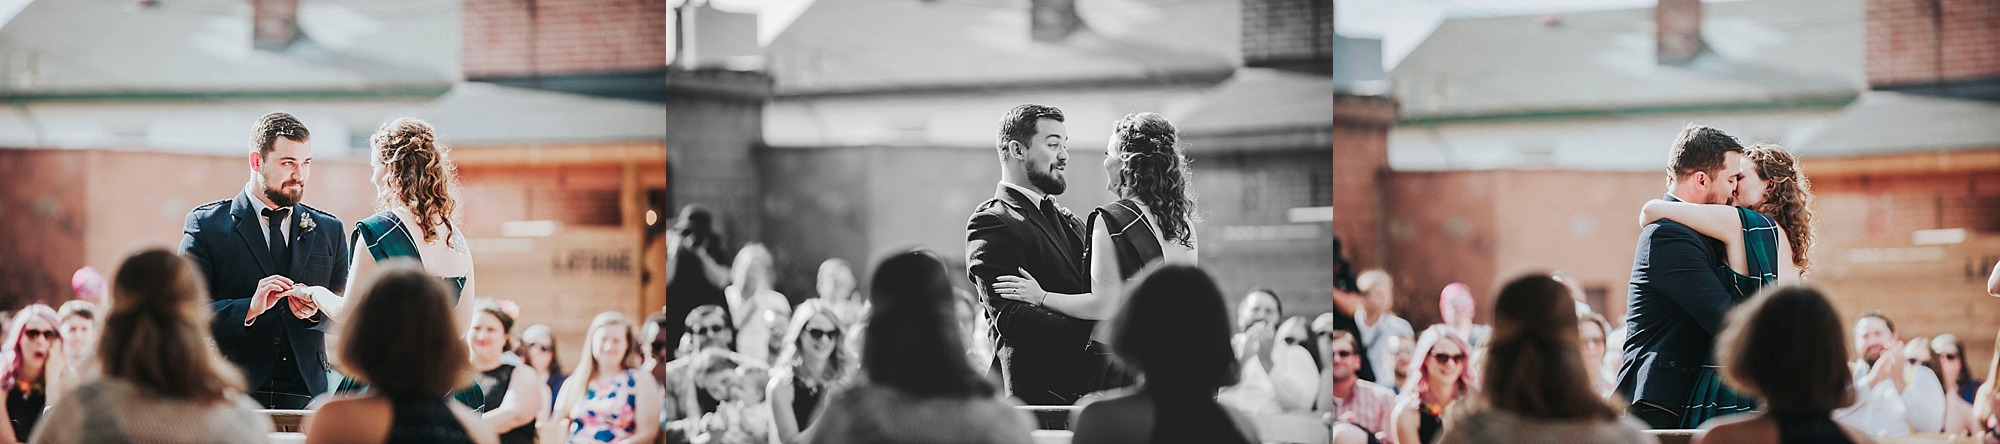 Quaker wedding pittsburgh